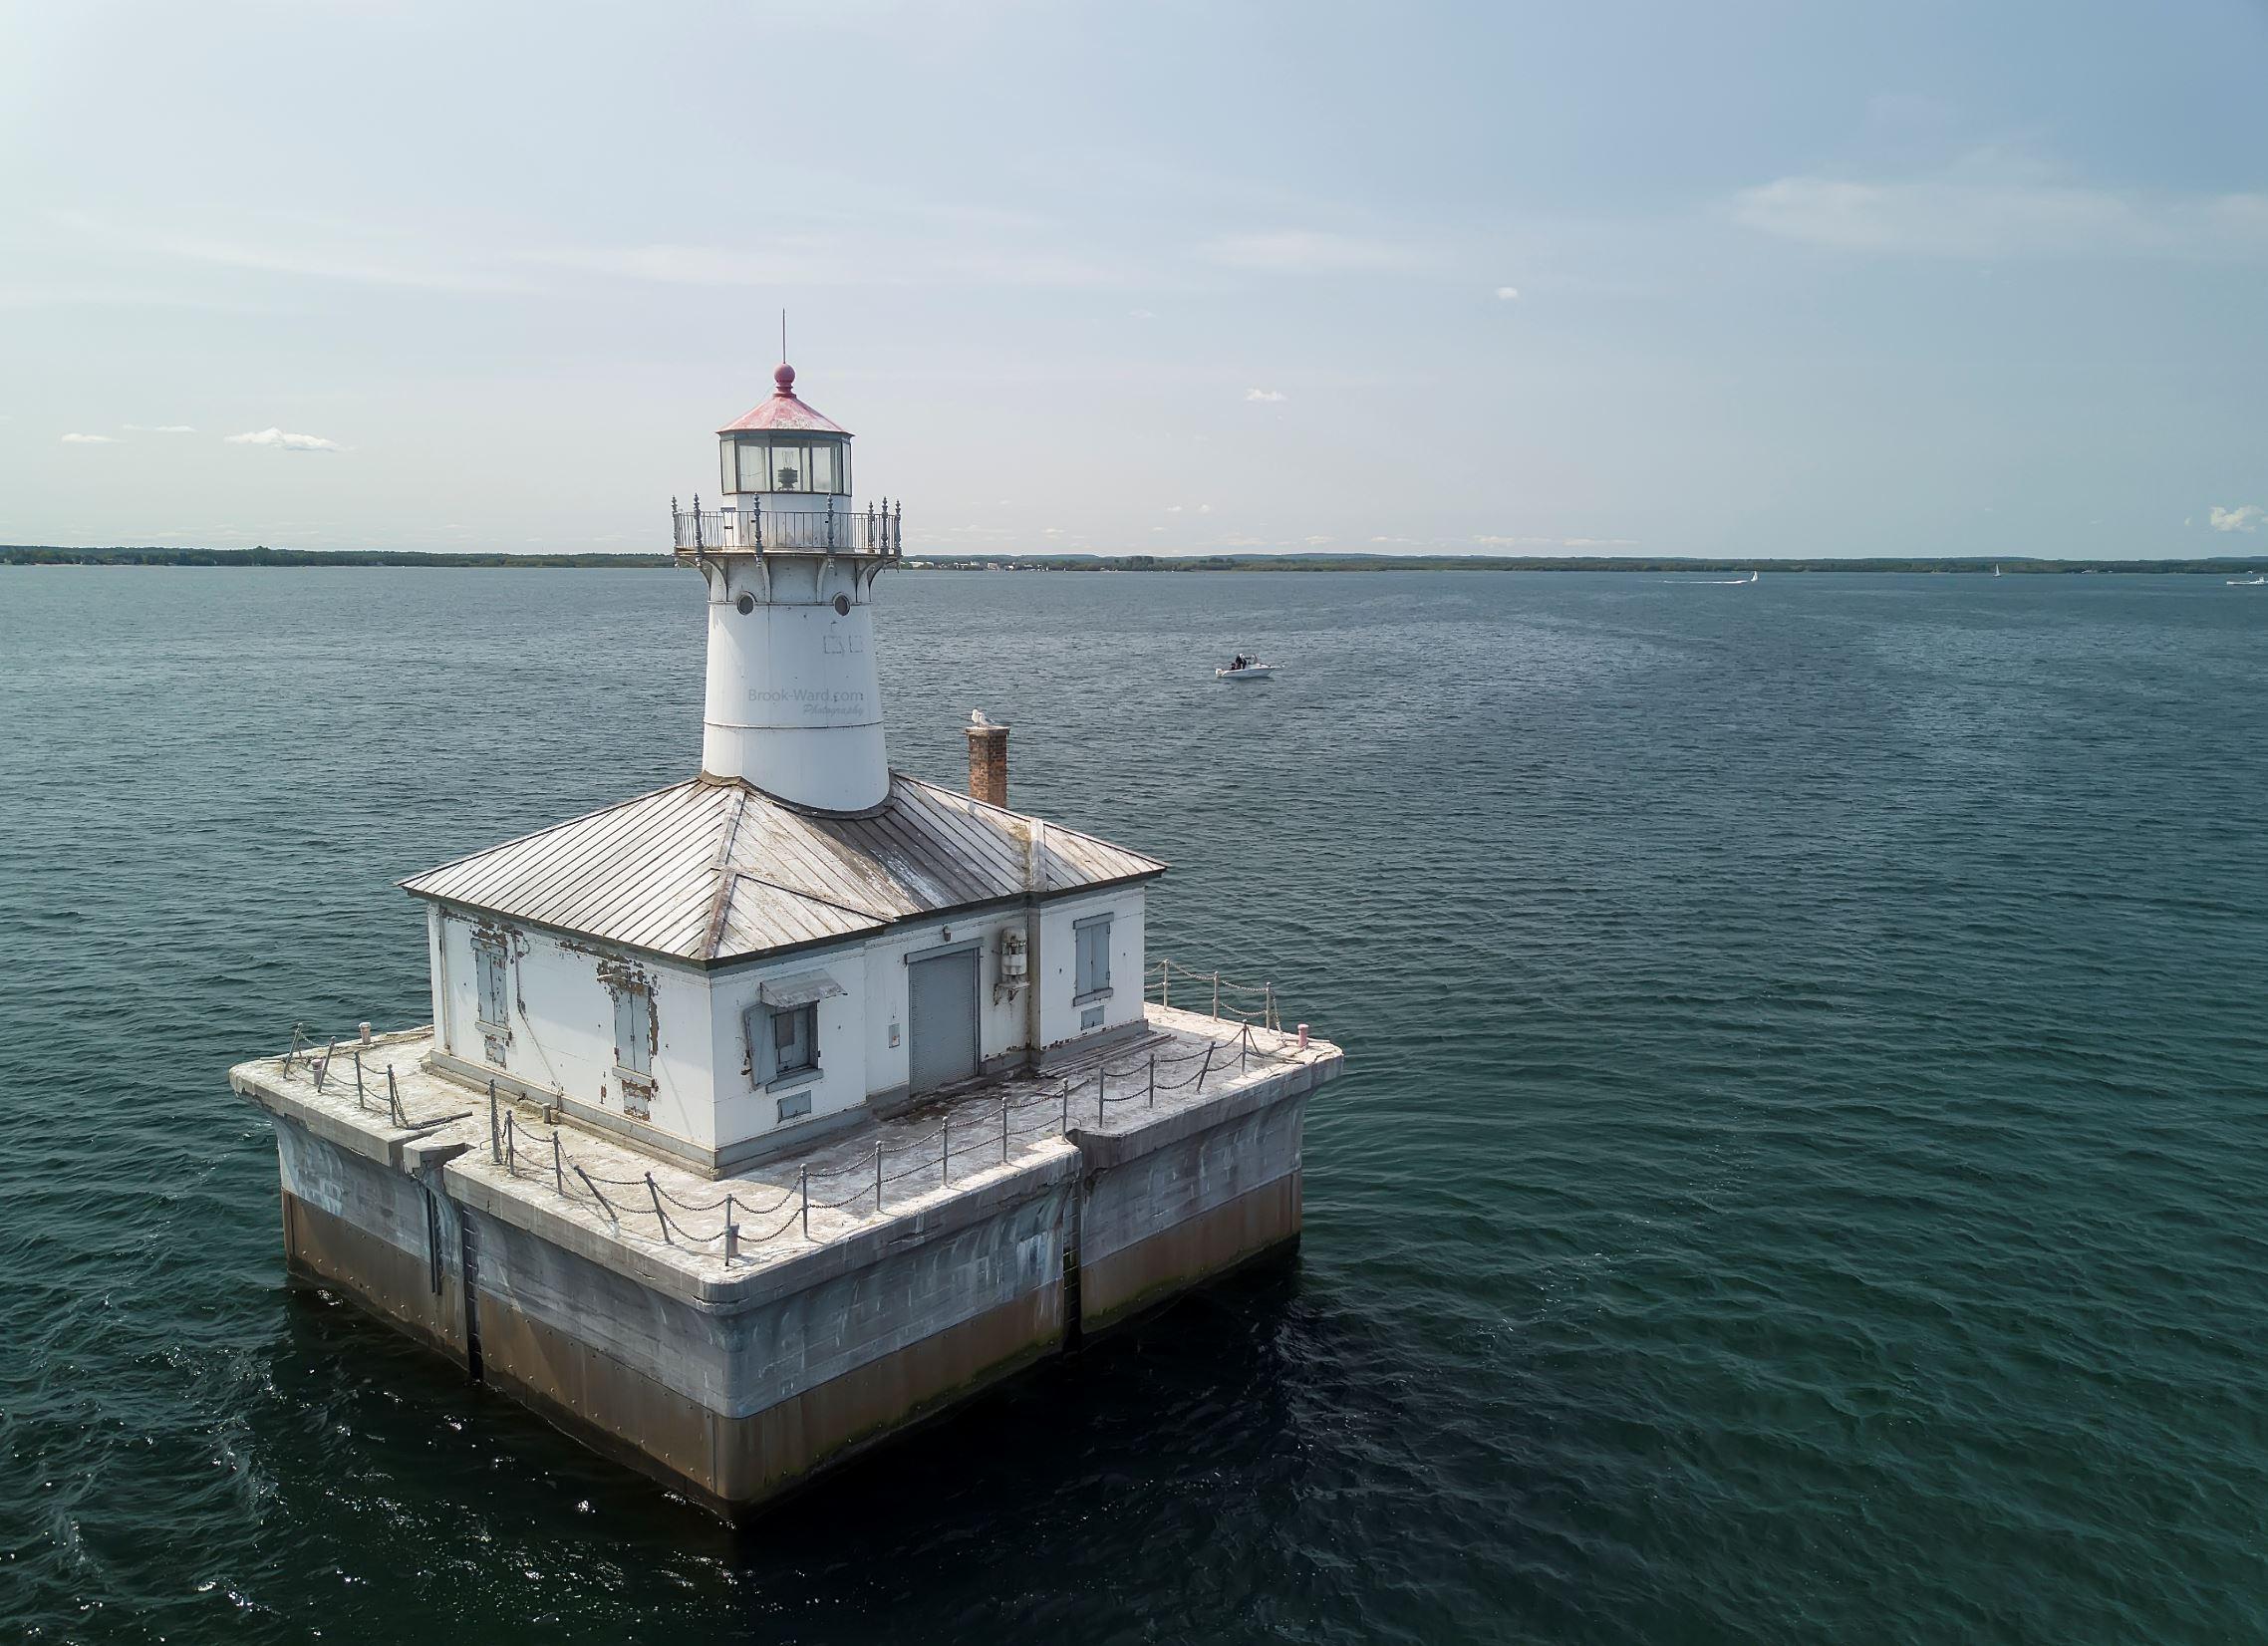 Cheboygan Point Lighthouse